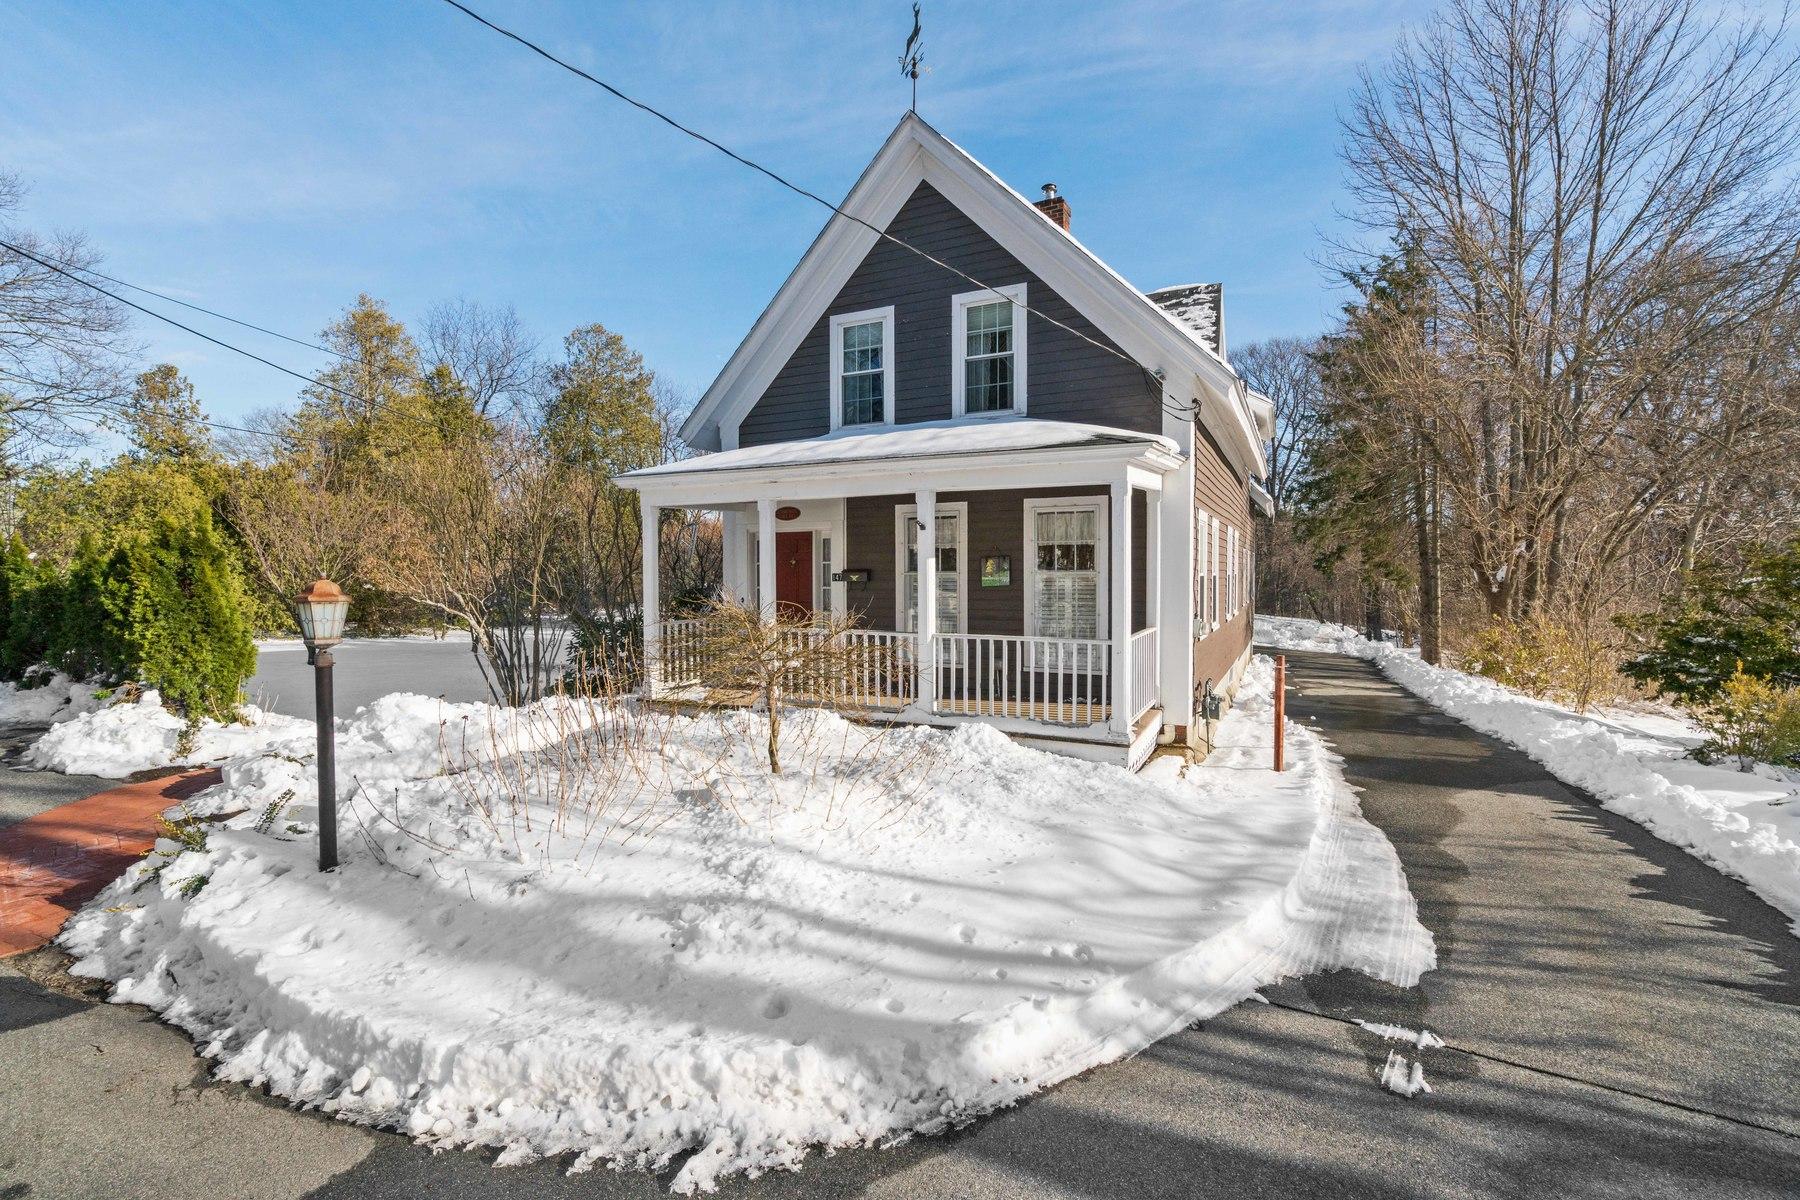 sales property at 147 Woburn St, Lexington, MA 02420